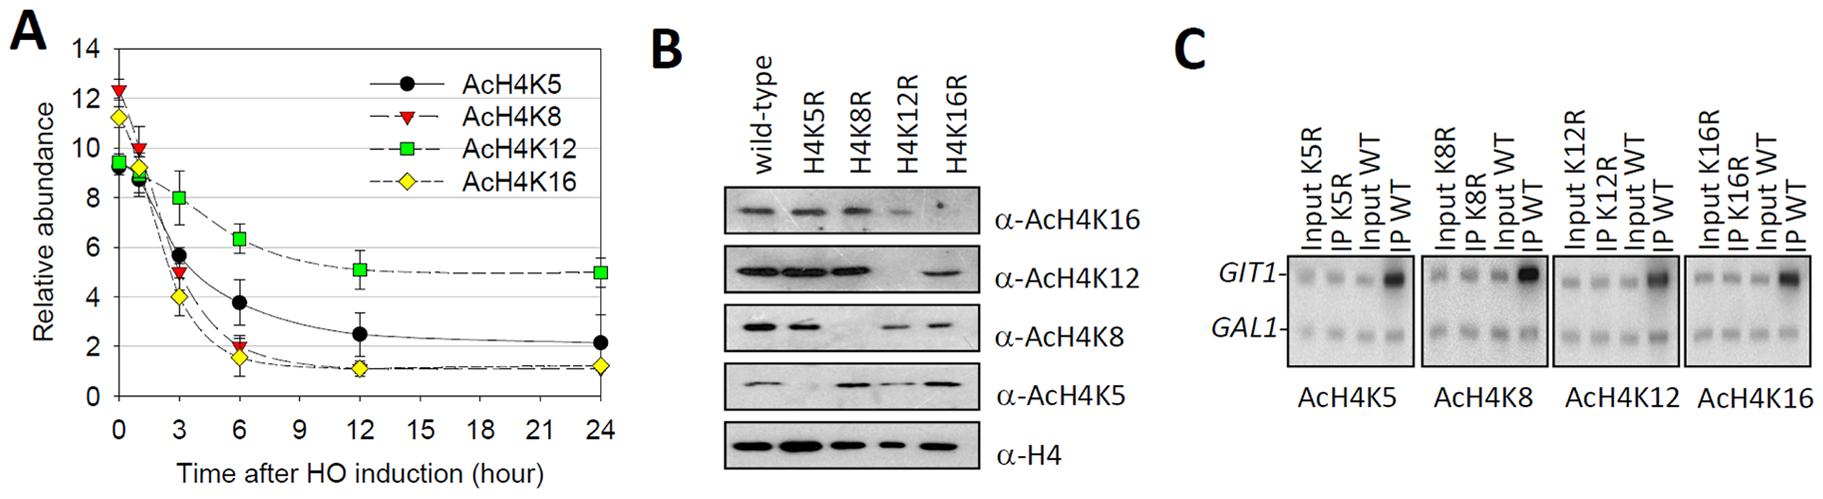 Histone H4K12 acetylation survives heterochromatin formation.